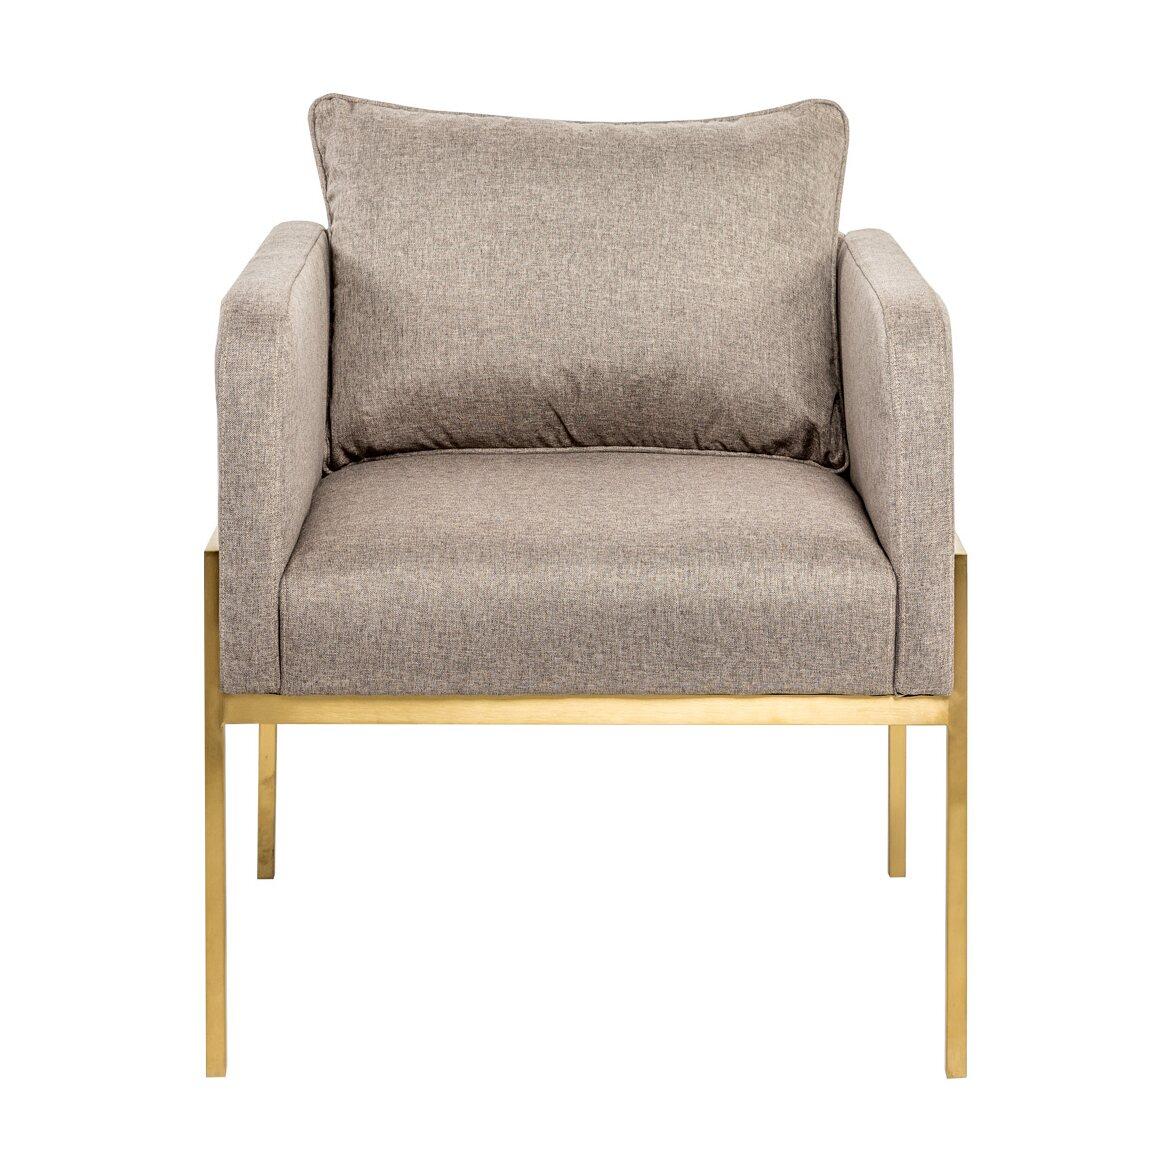 Кресло «Легато / Грэй» | Кресло-стул Kingsby